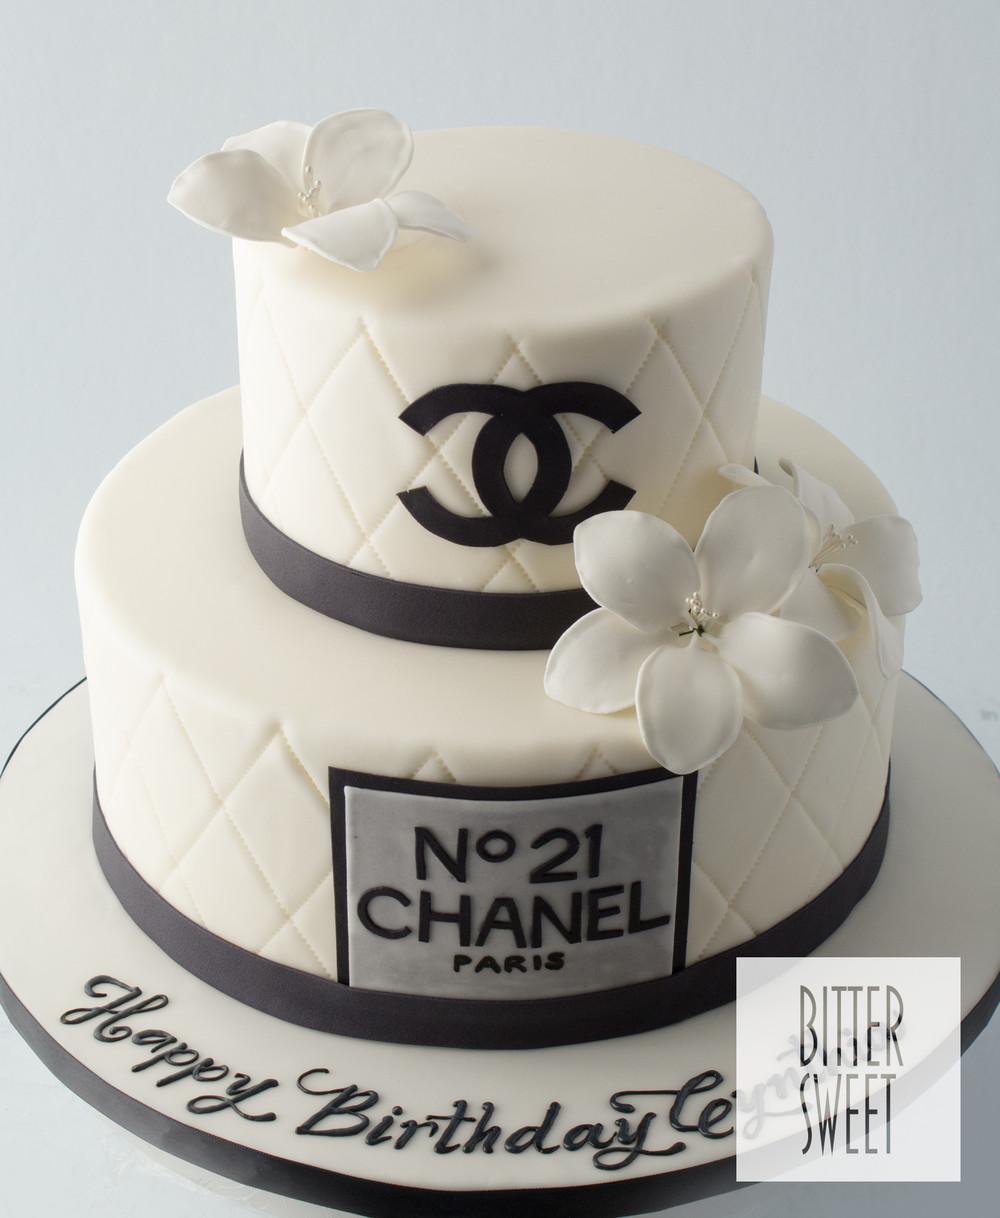 Bittersweet Birthday_Chanel.jpg